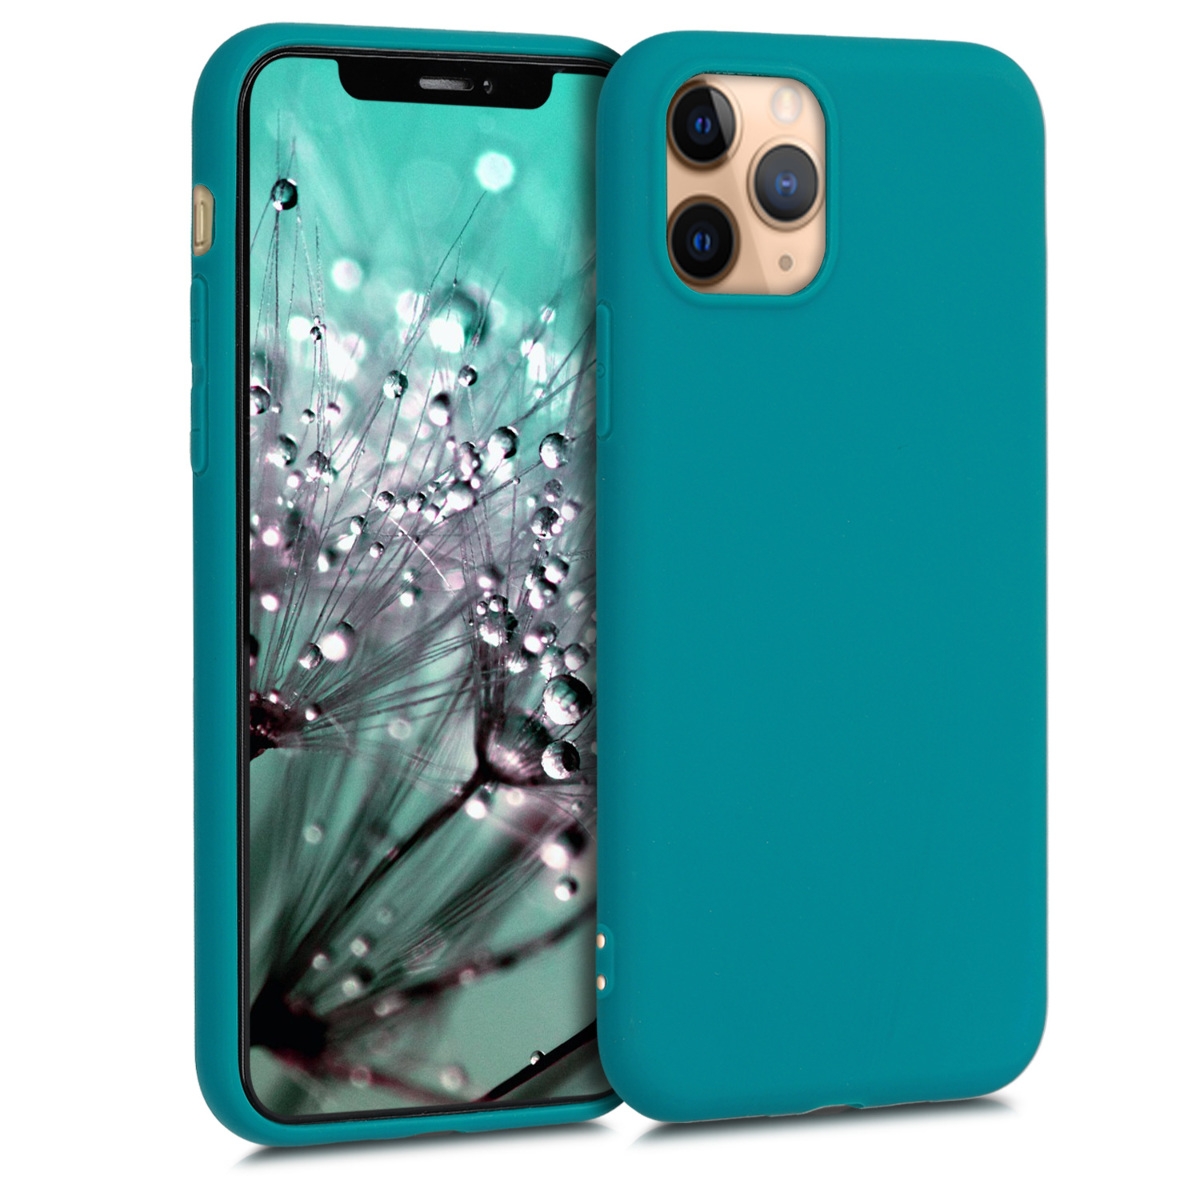 KW Θήκη Σιλικόνης Apple iPhone 11 Pro - Teal Matte (49788.57)